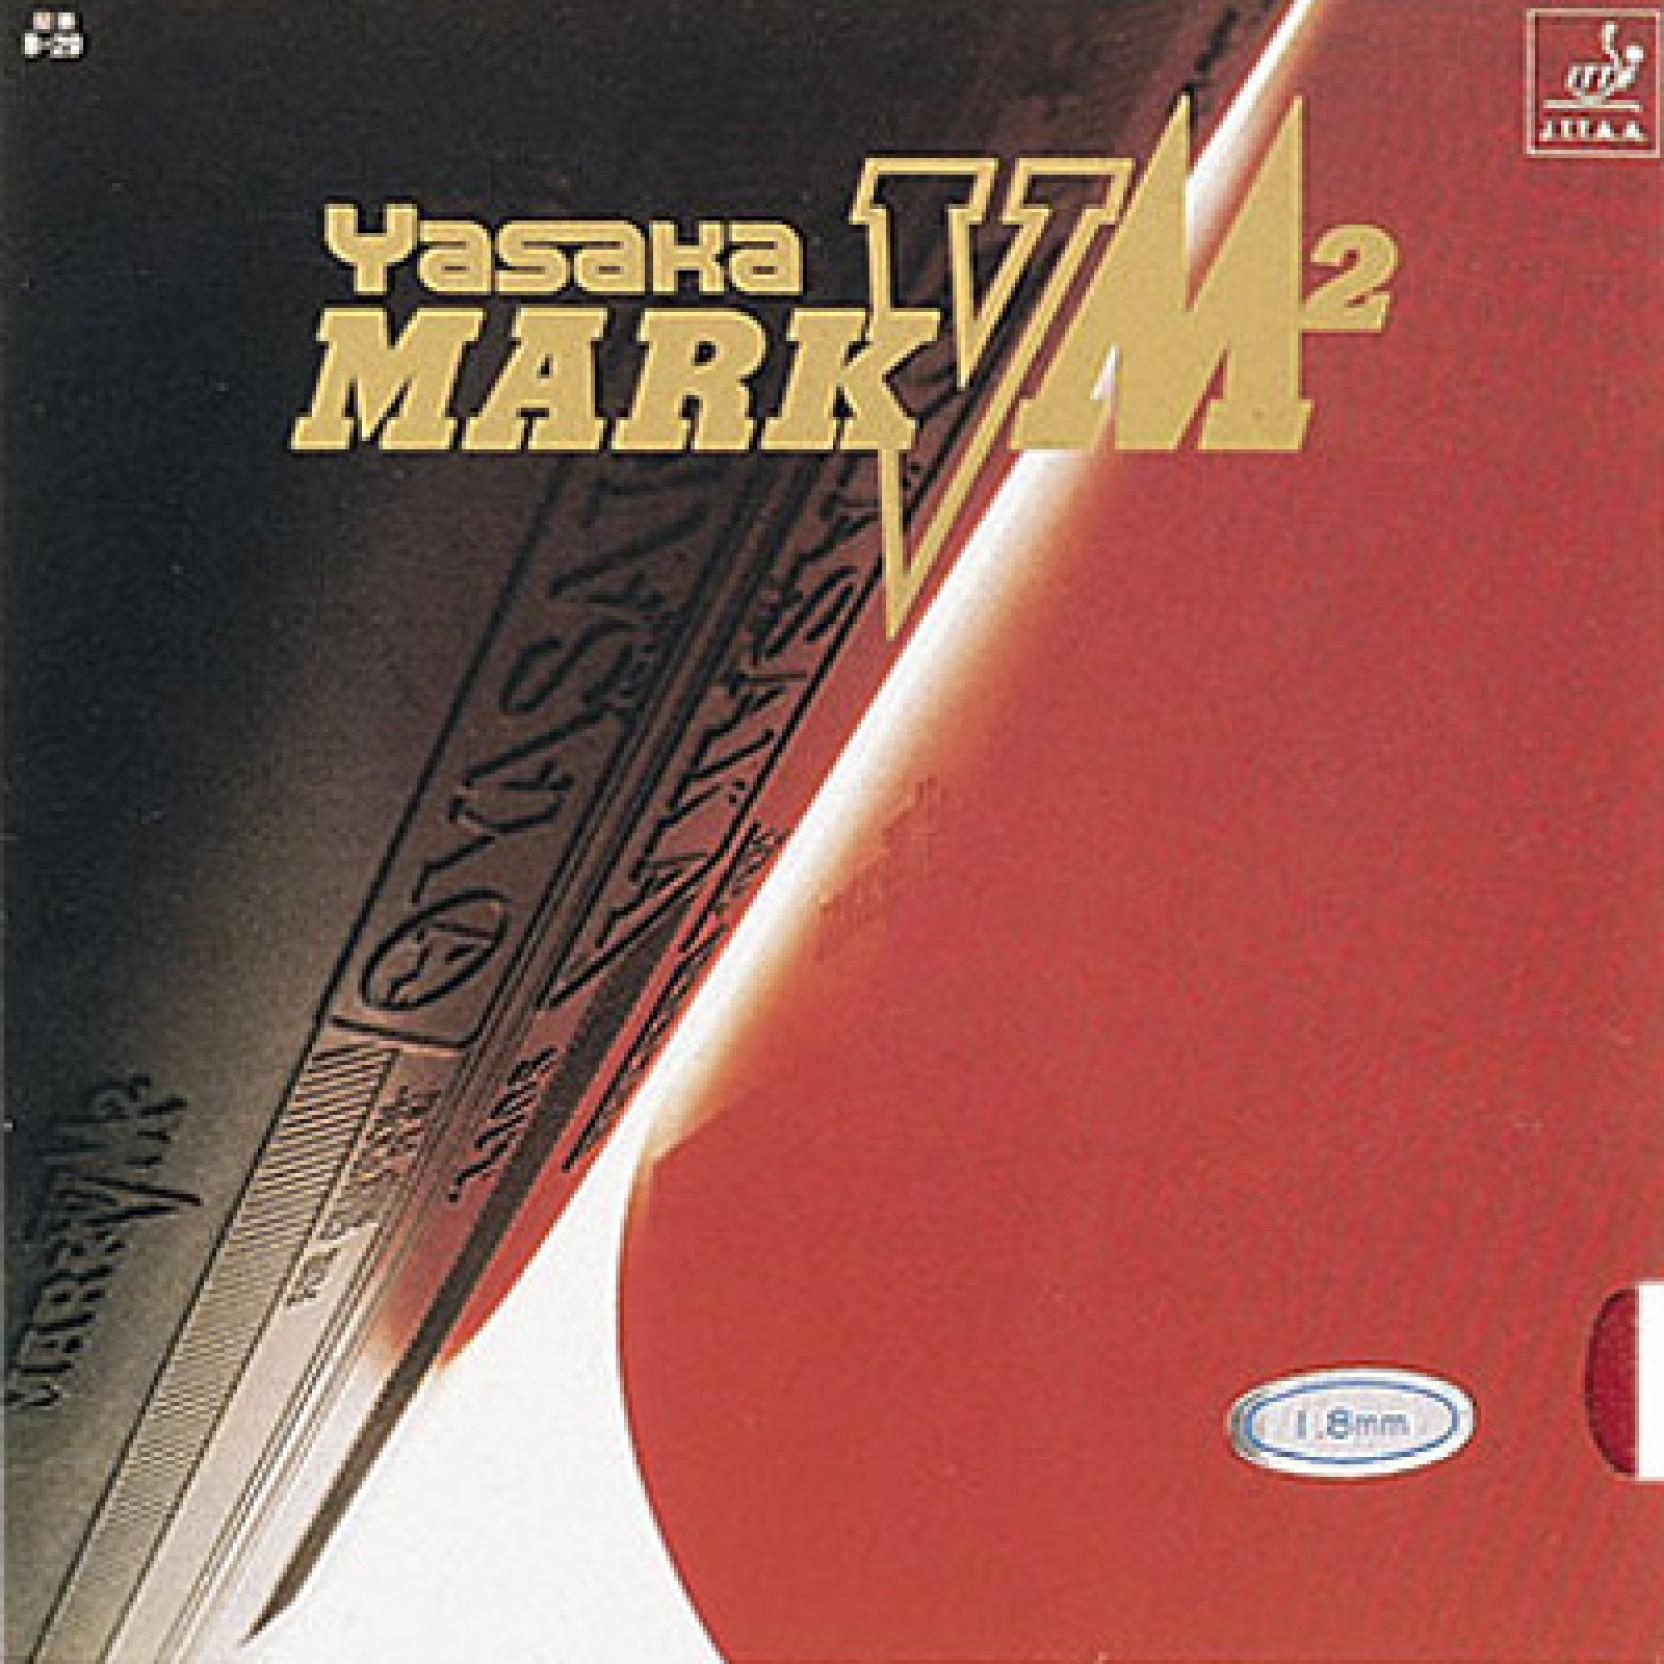 Yasaka Mark V M2 Max Table Tennis Rubber Buy Yasaka Mark